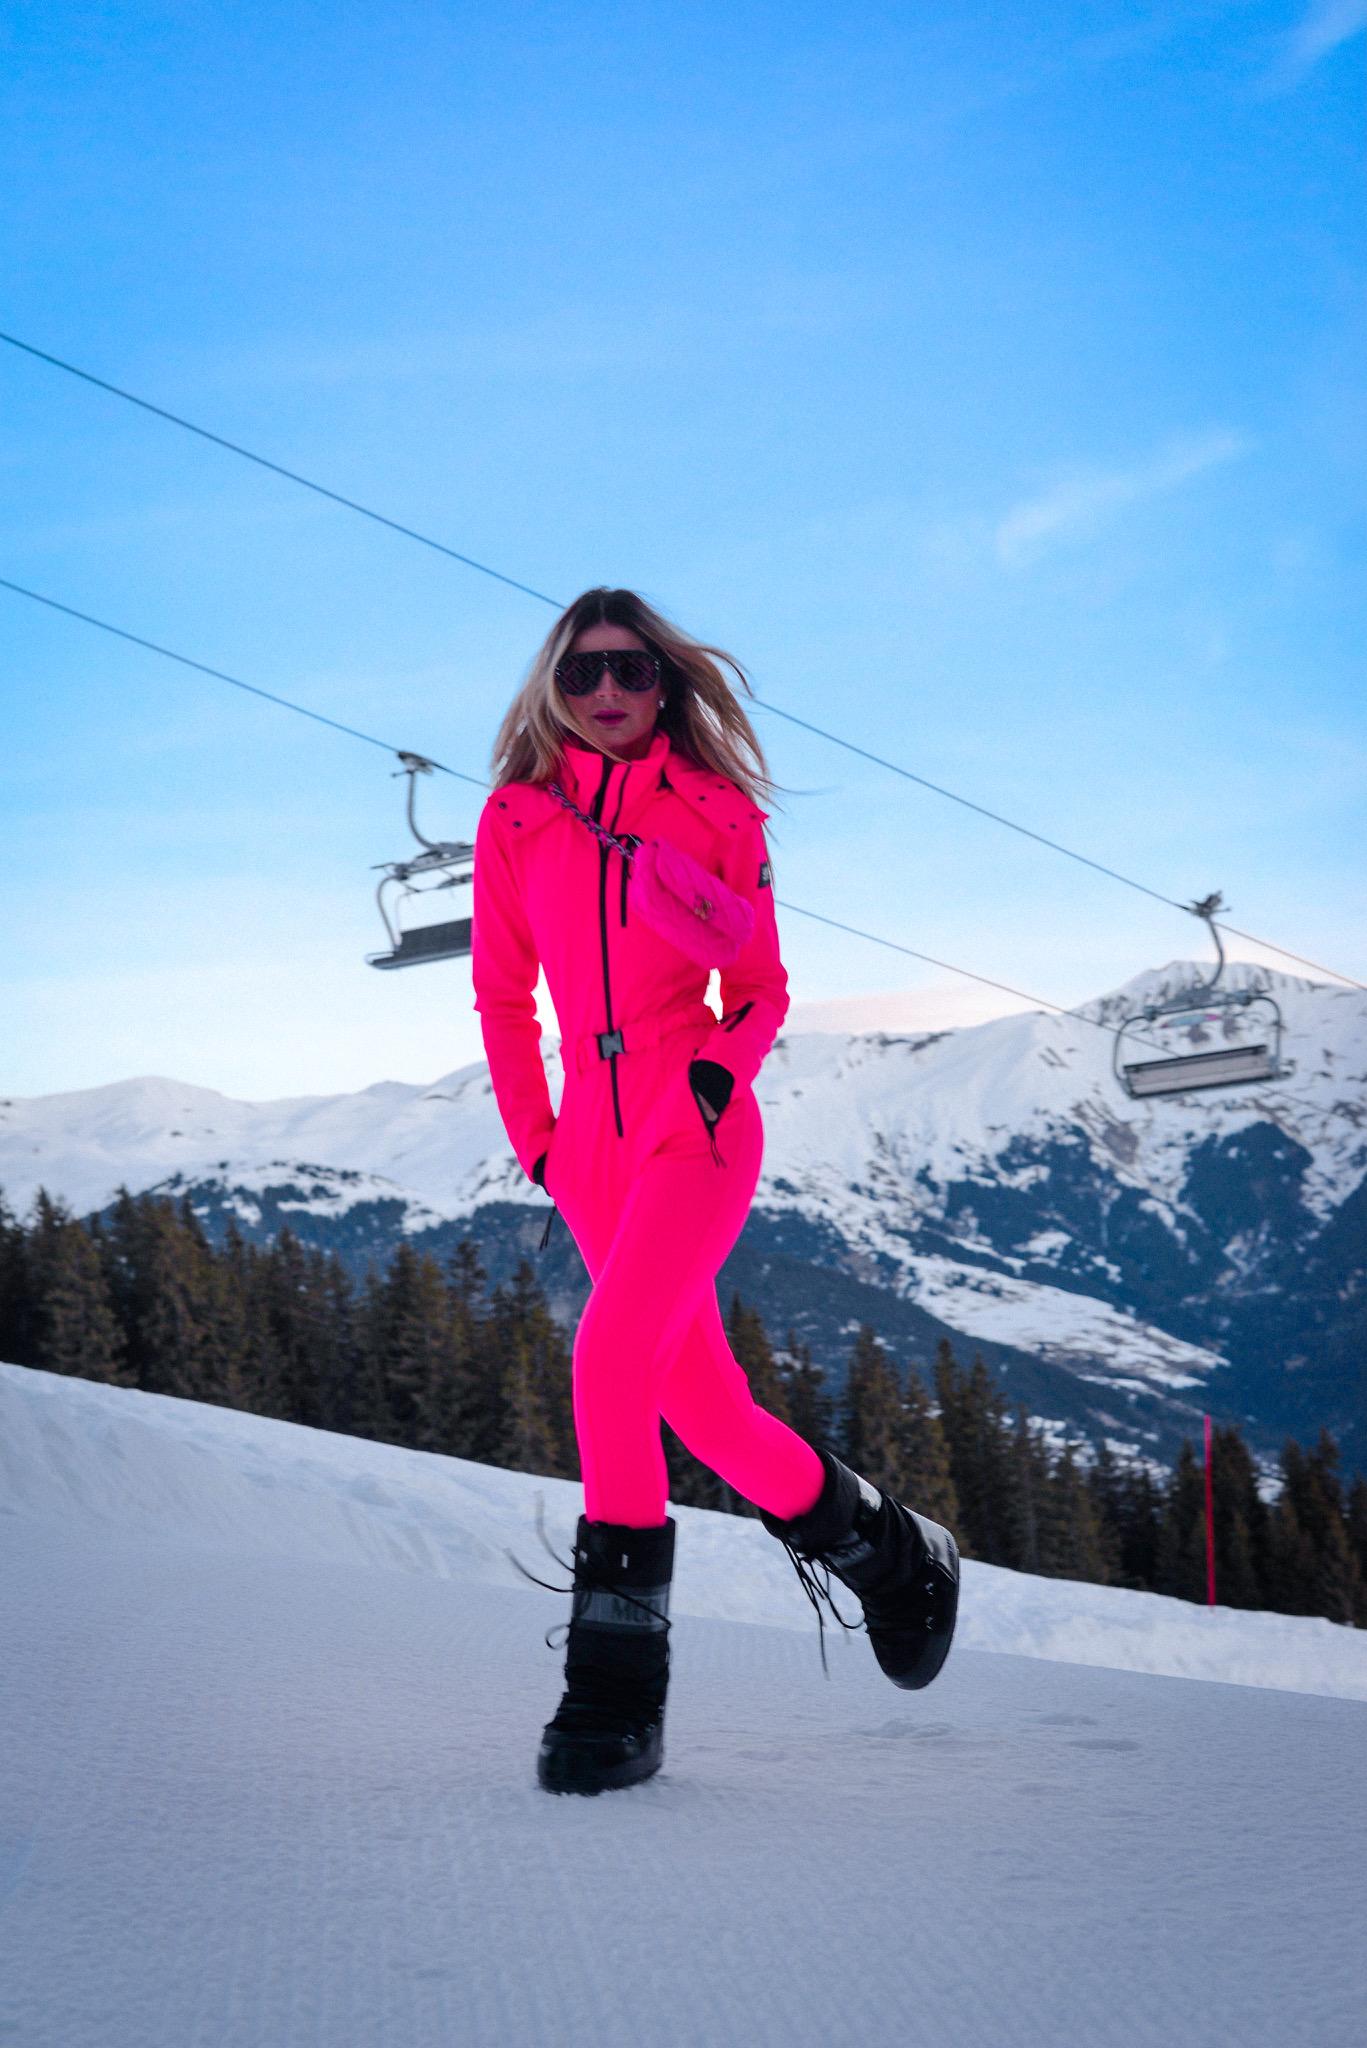 Thássia courchevel esqui pink 1